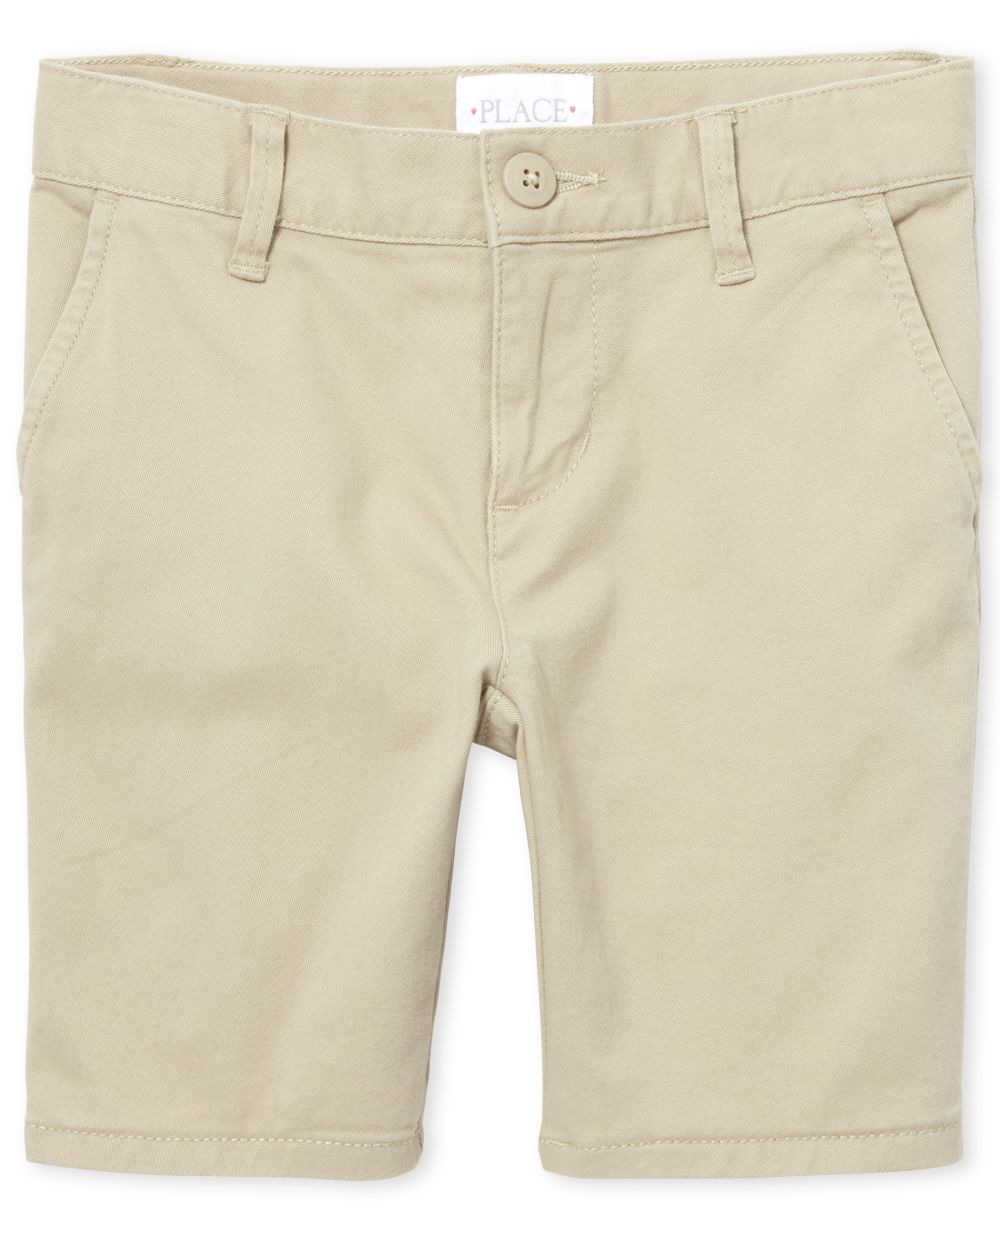 Pantalones cortos chinos de uniforme para niñas